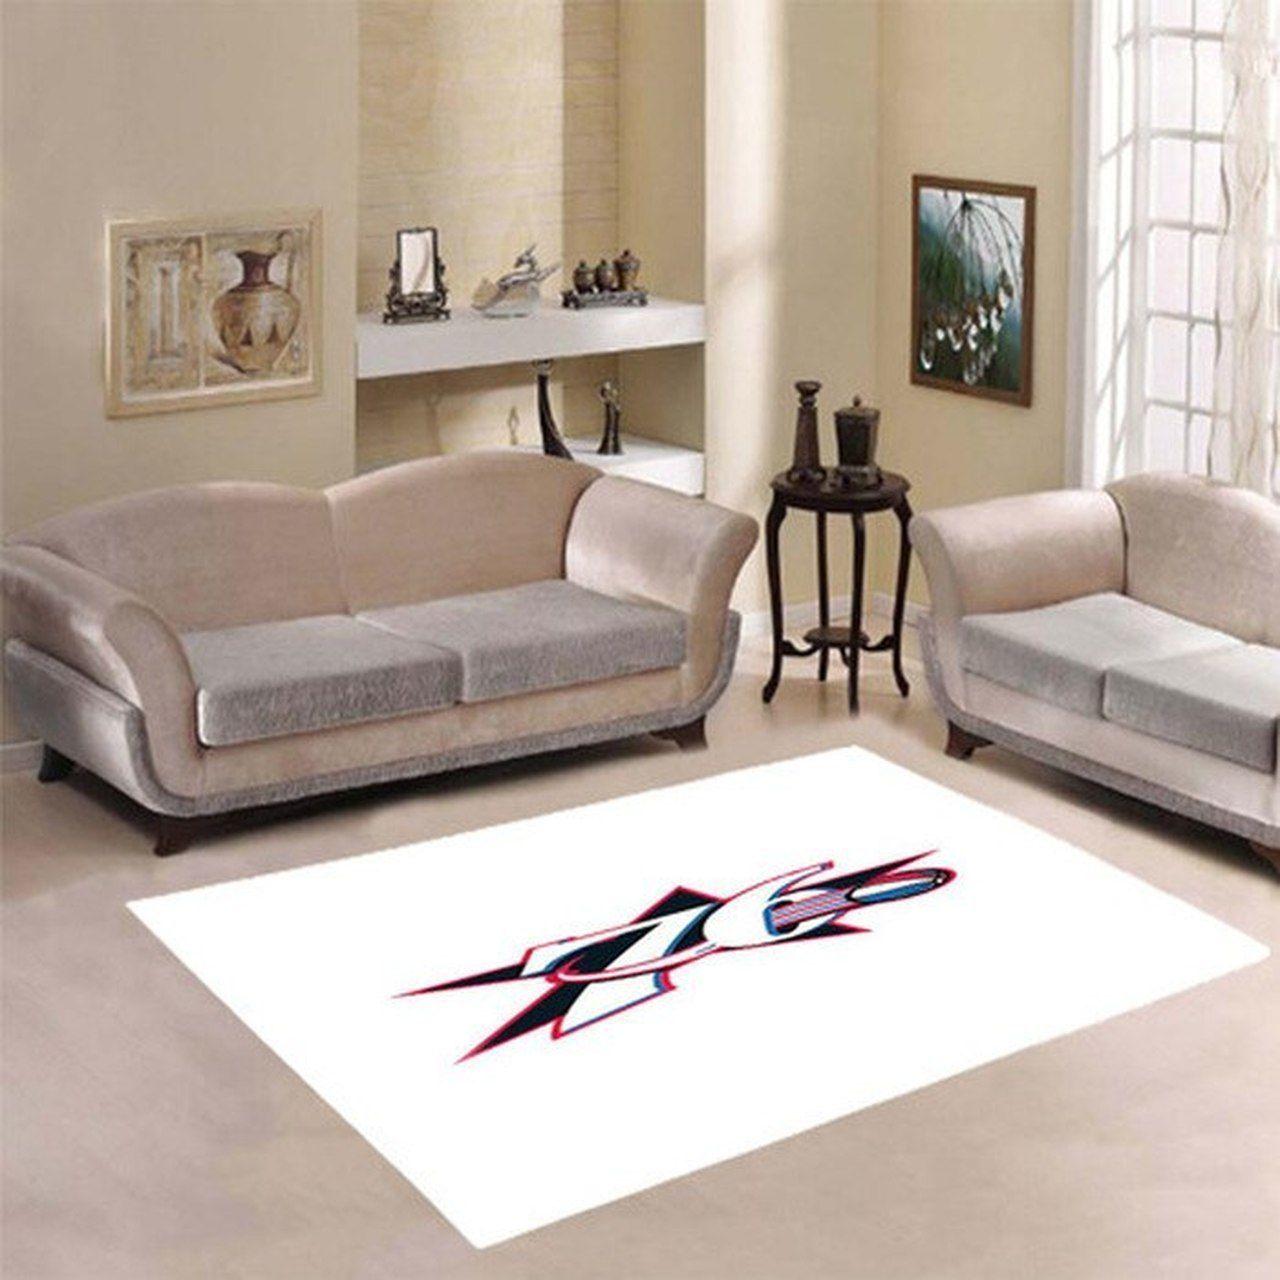 Amazon Philadelphia 76ers Living Room Area No4478 Rug